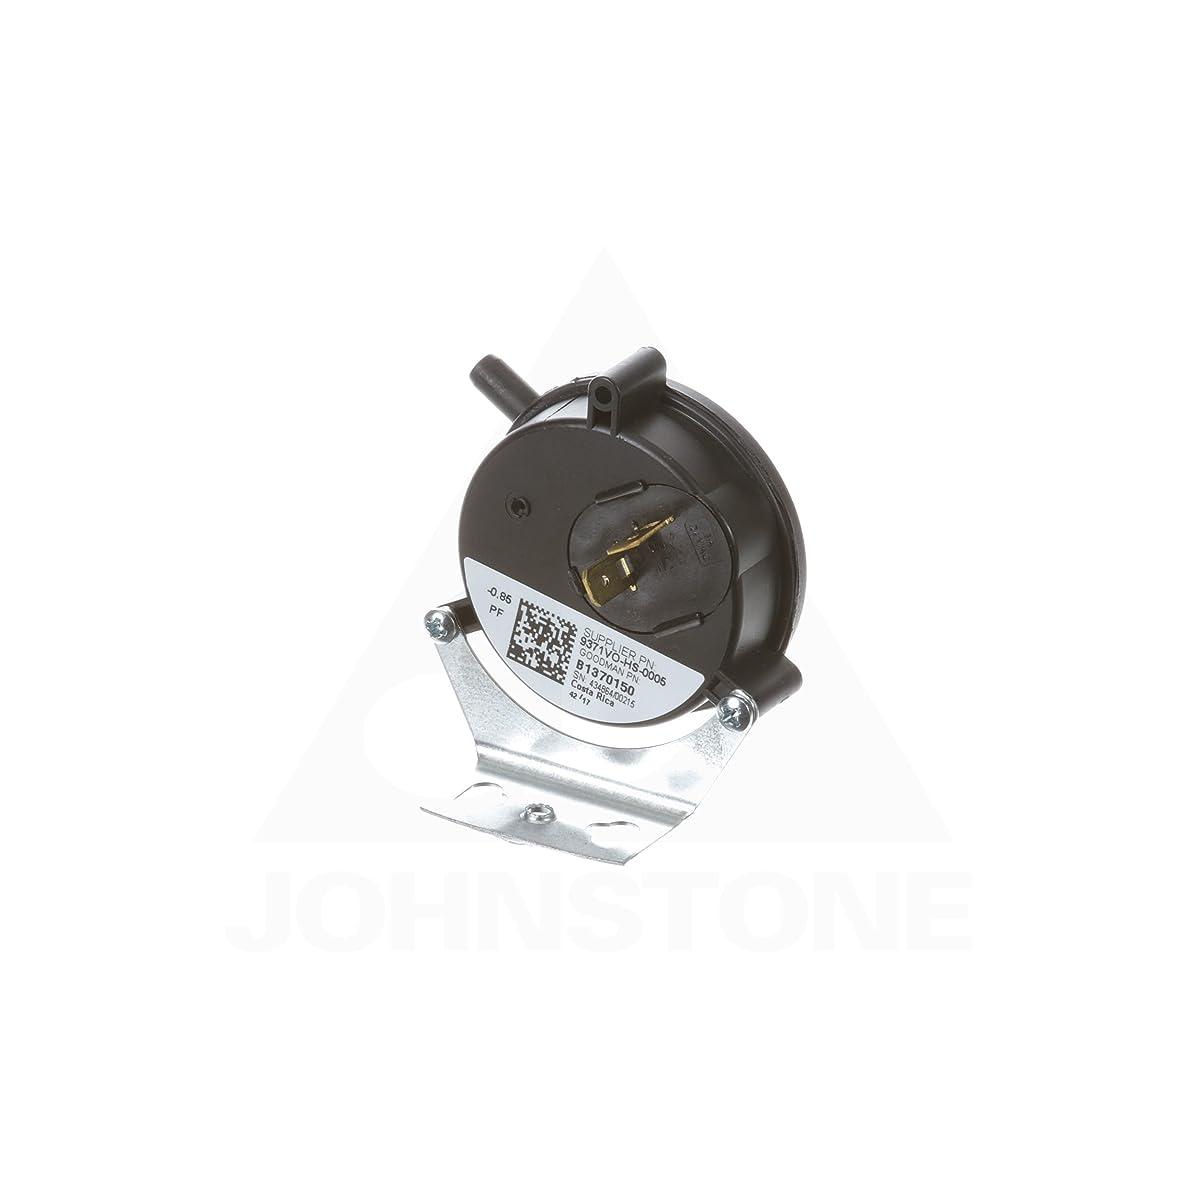 Goodman B1370150 Pressure Switch Air